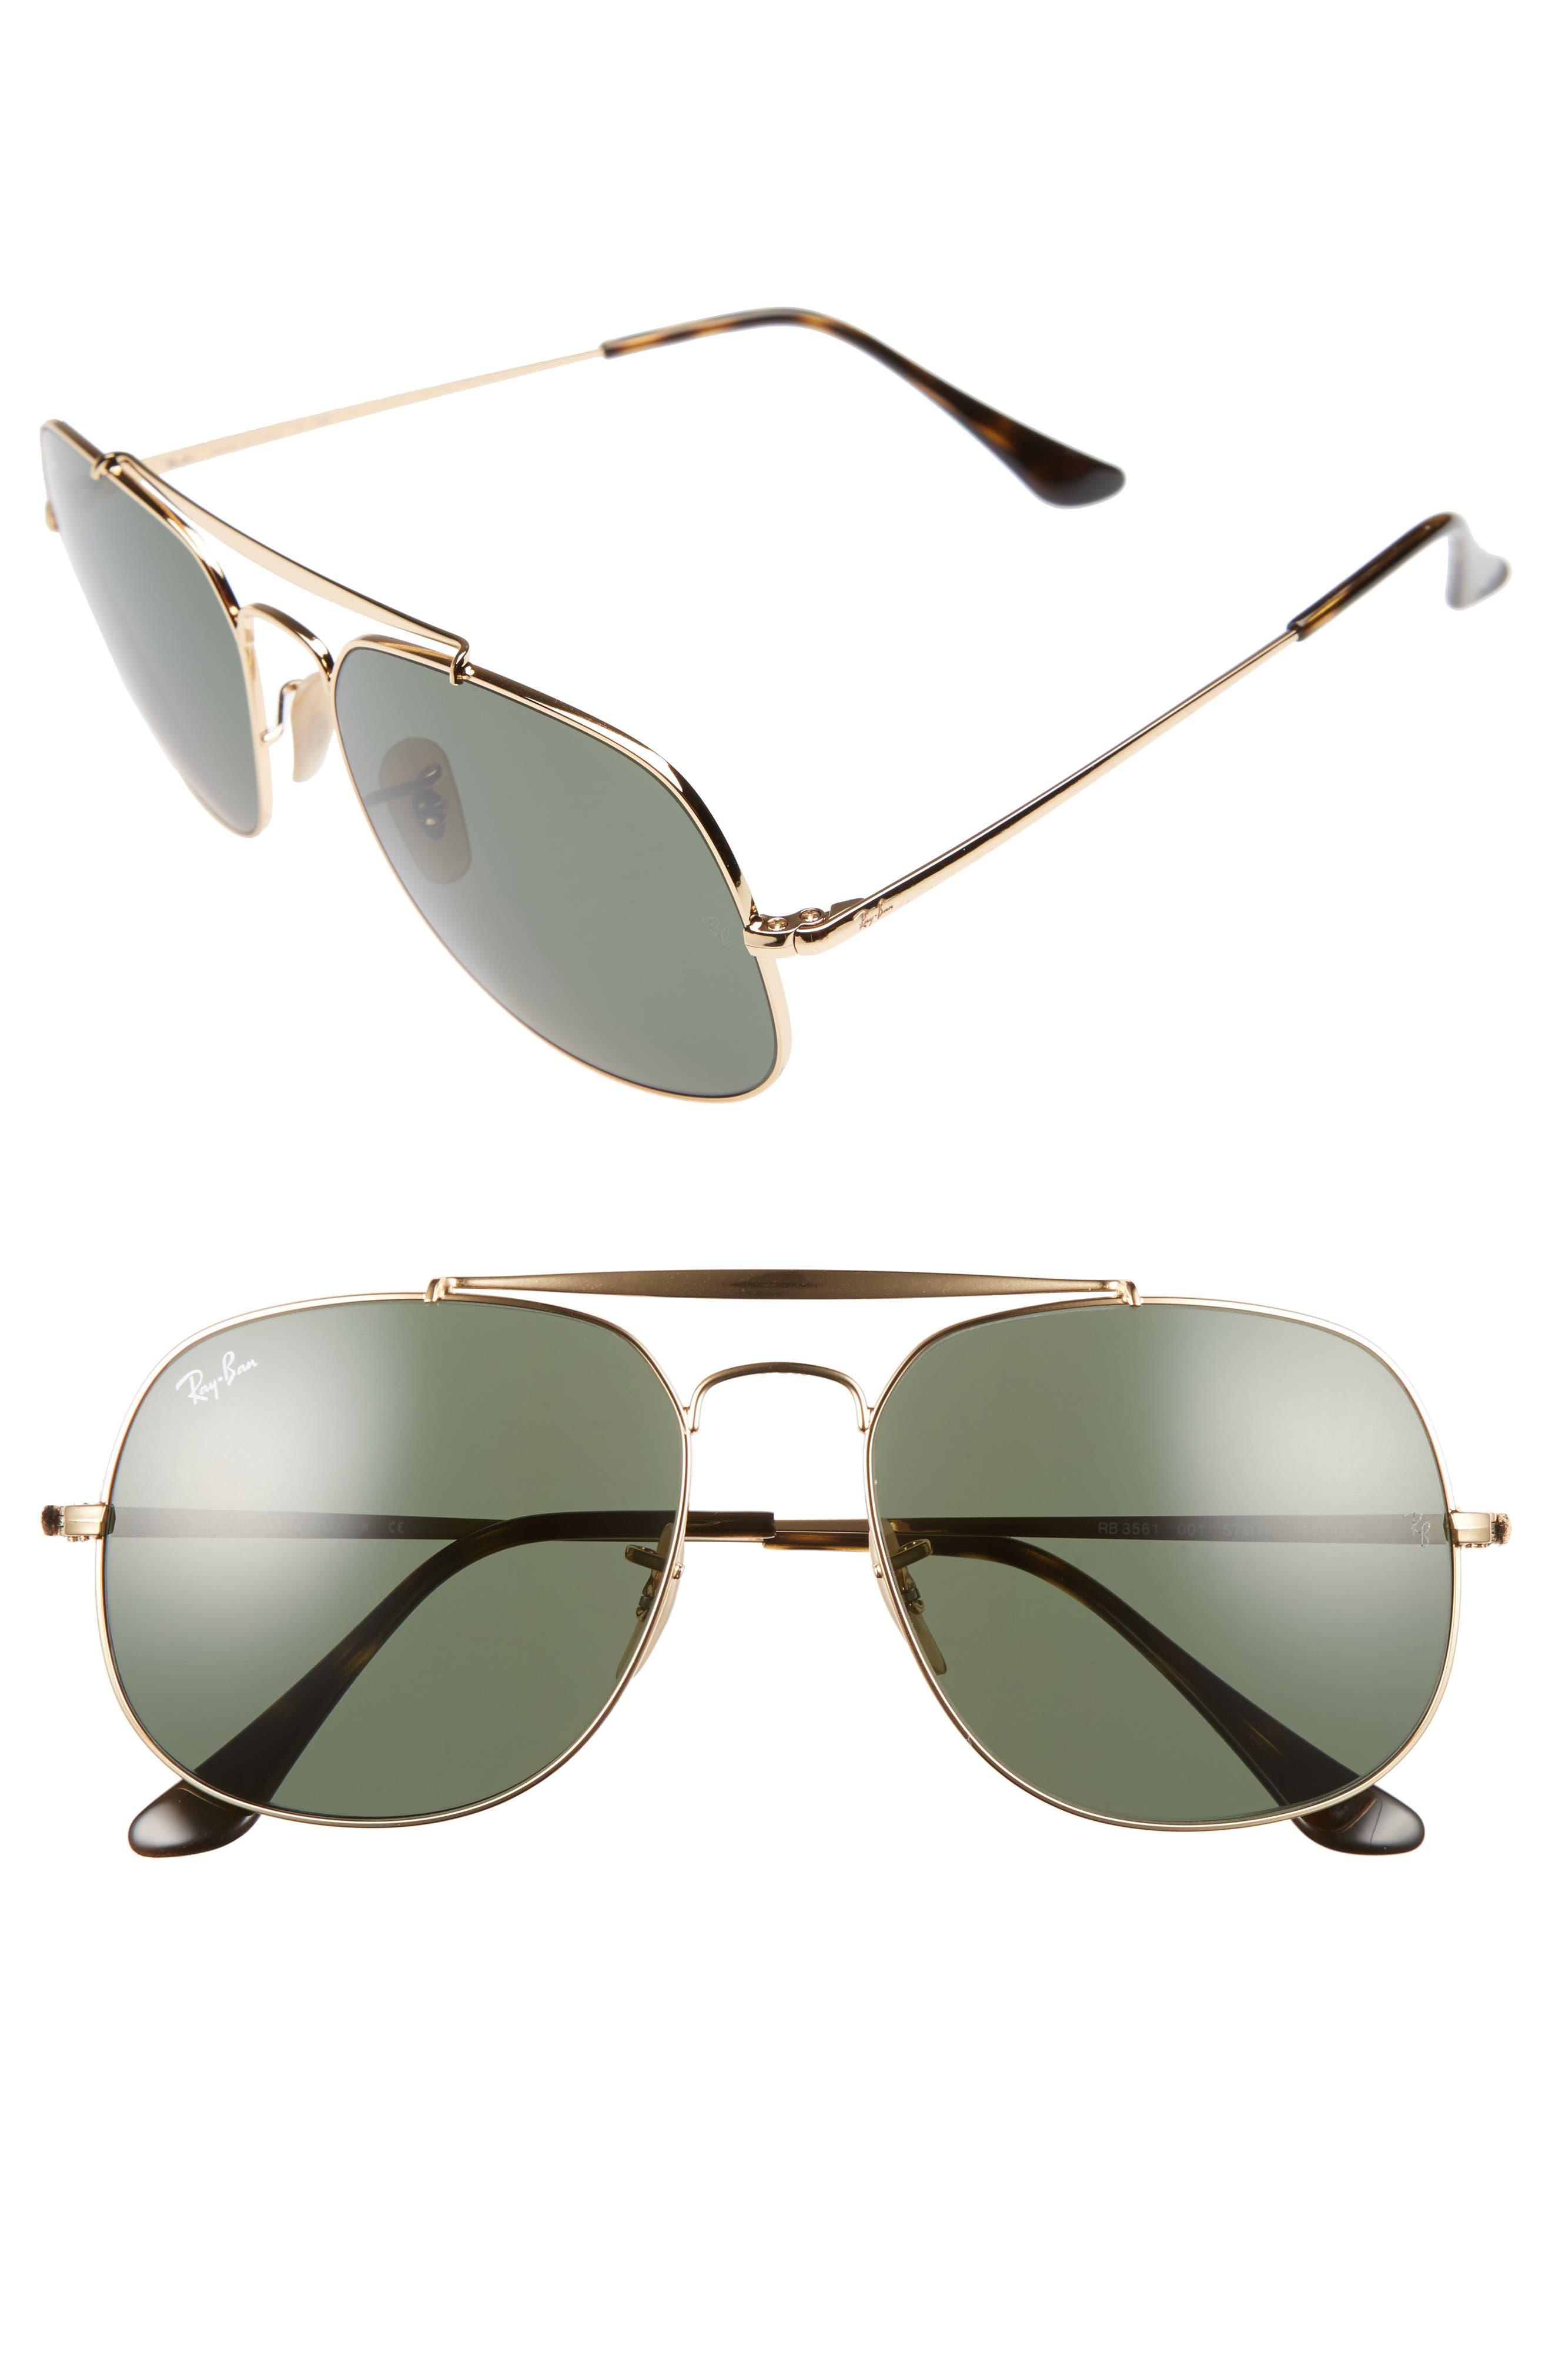 Ray-Ban The General 57Mm Aviator Sunglasses -